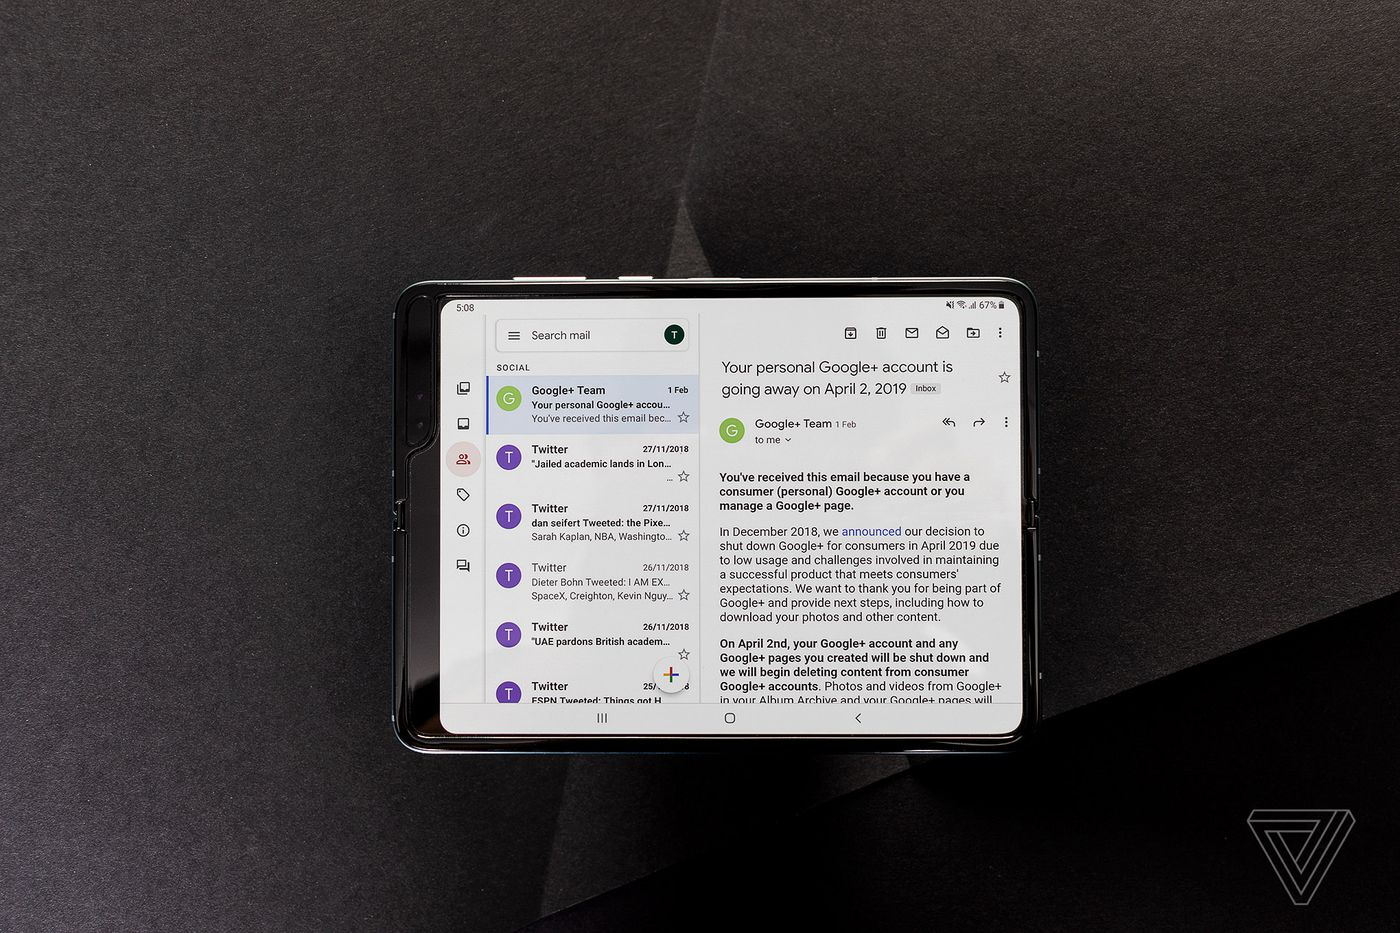 Samsung Galaxy Fold review: broken dream - The Verge